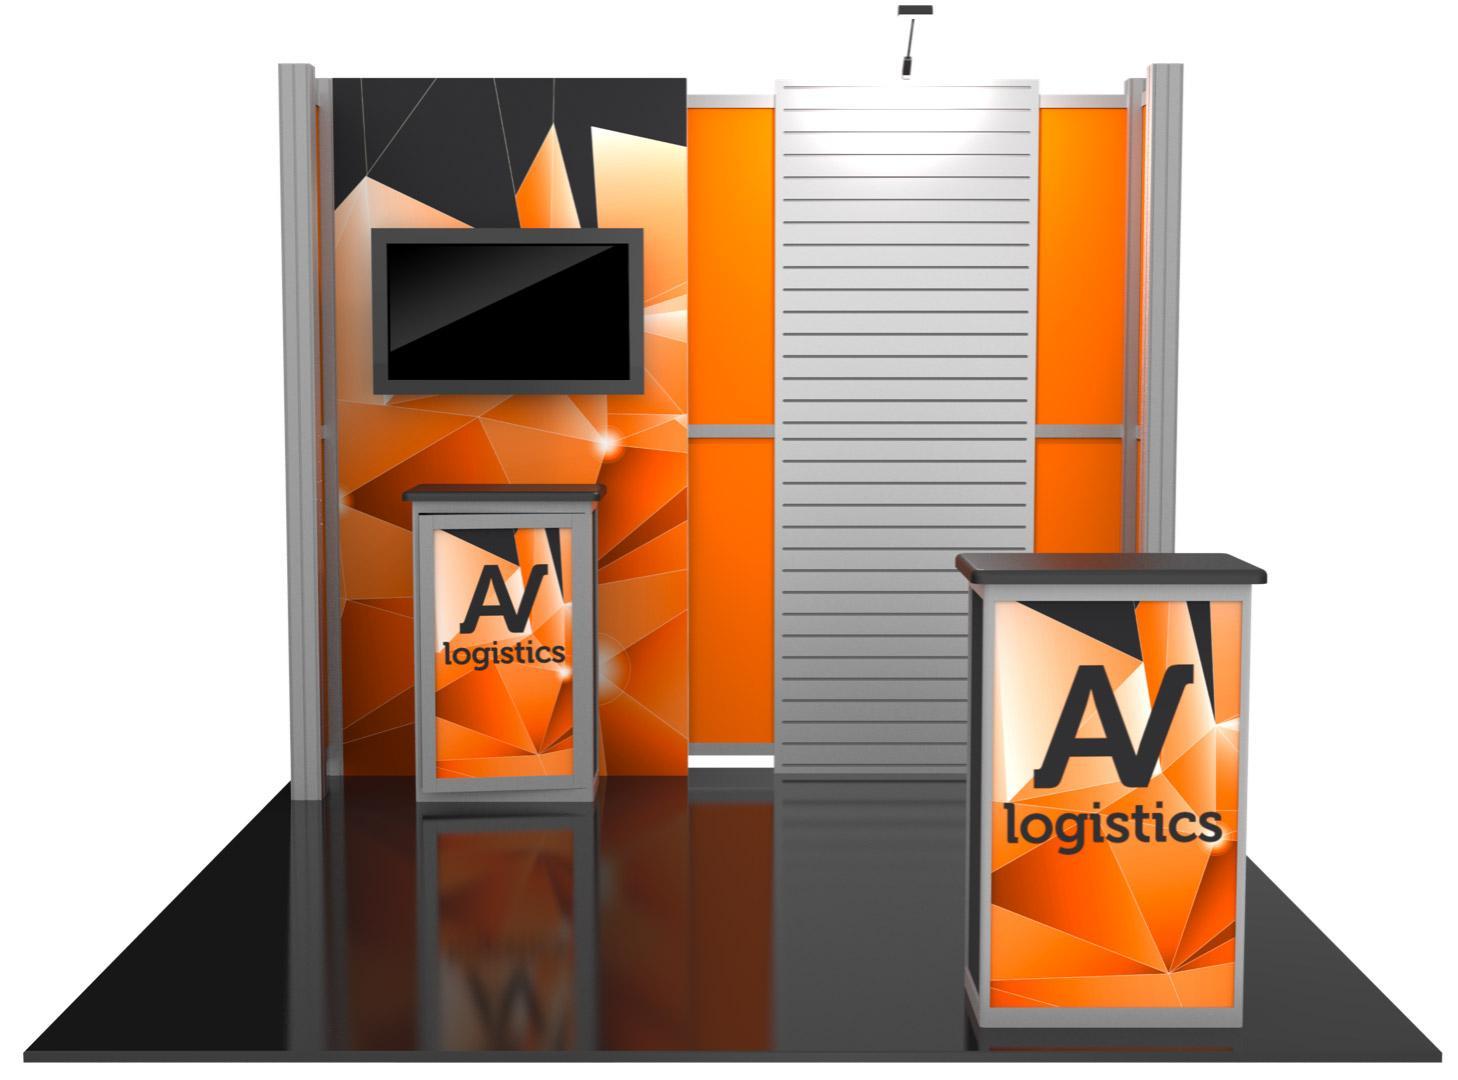 Hybrid Pro Modular Kit 08, hybrid trade show displays, Modular displays, hybrid display, hybrid exhibits, hybrid displays, custom modular exhibits